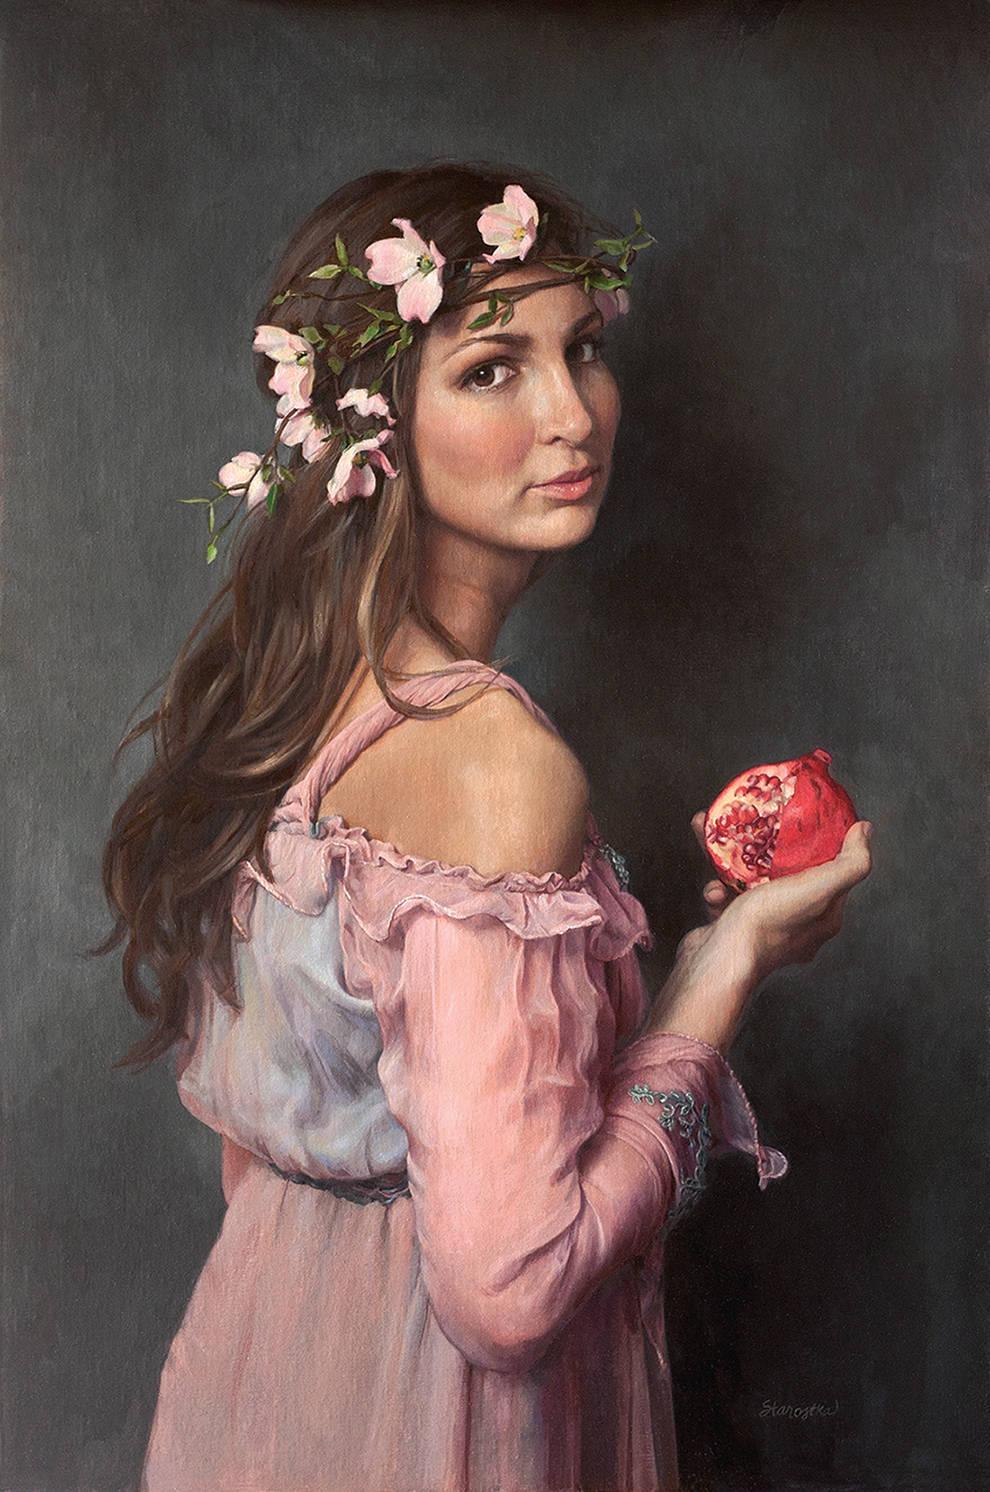 Persephone by Ardith Starotska